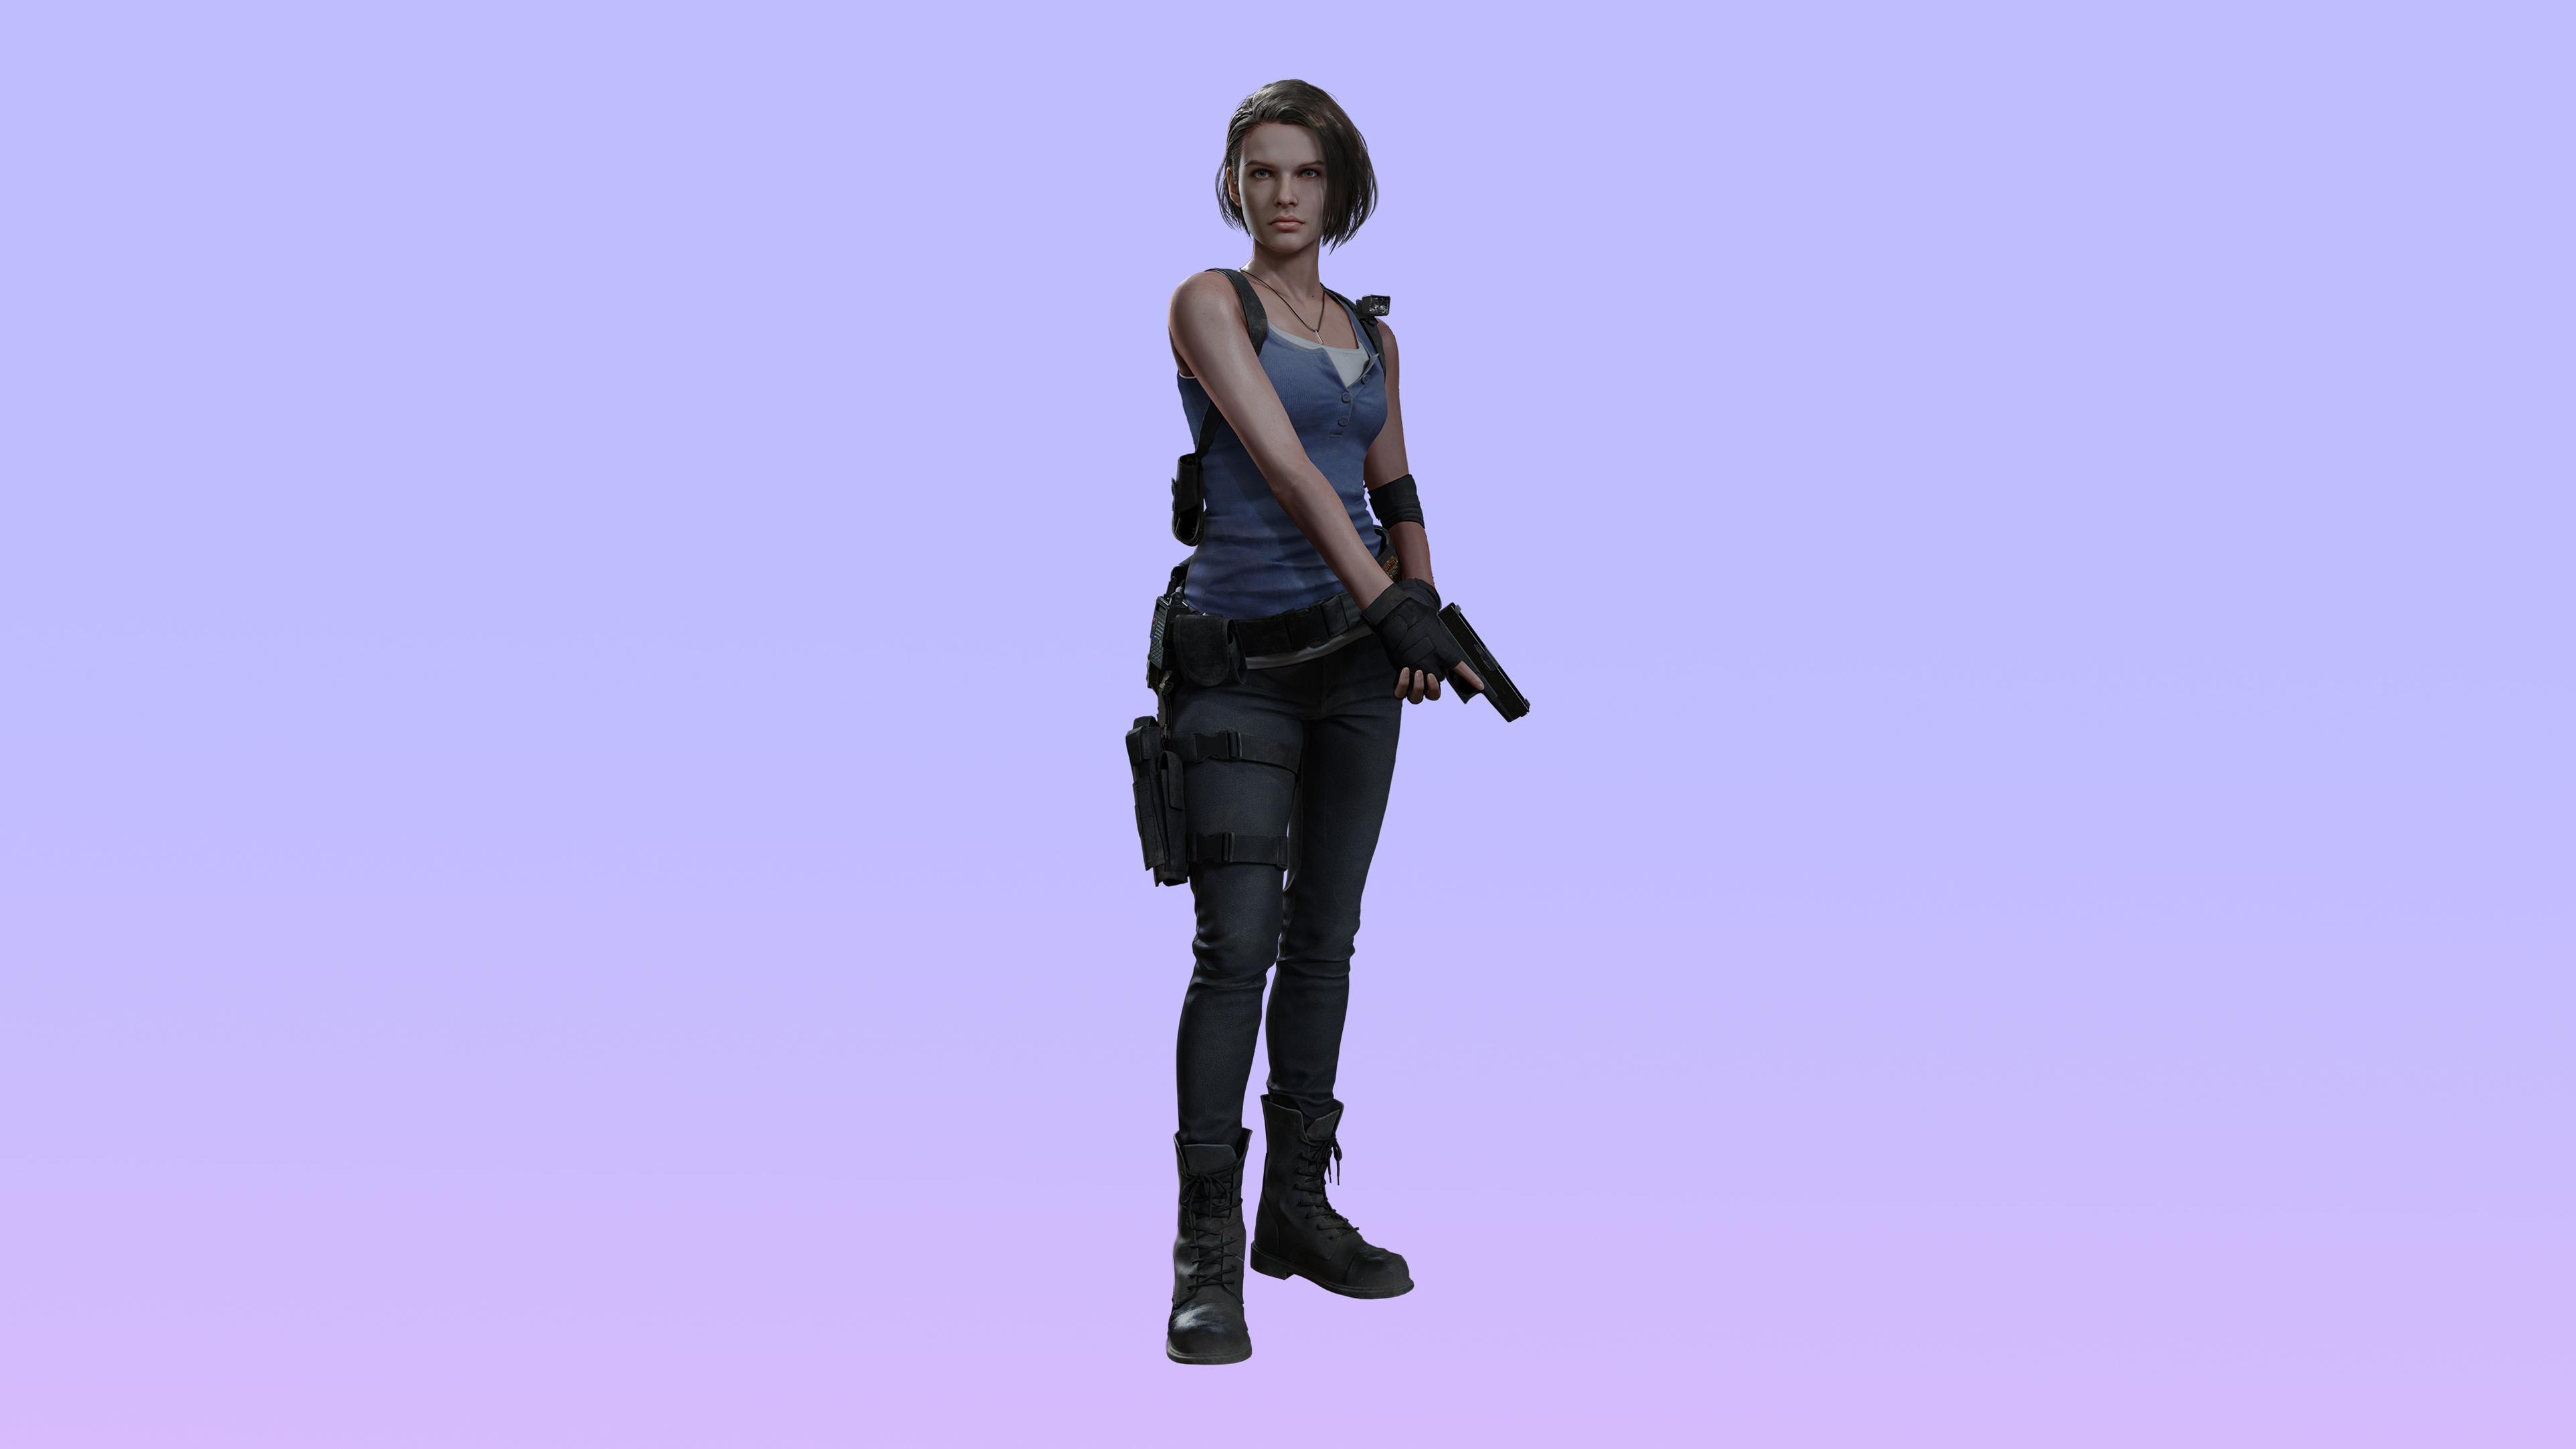 Jill Valentine Resident Evil 3 Remake 4k Wallpaper Hd Games 4k